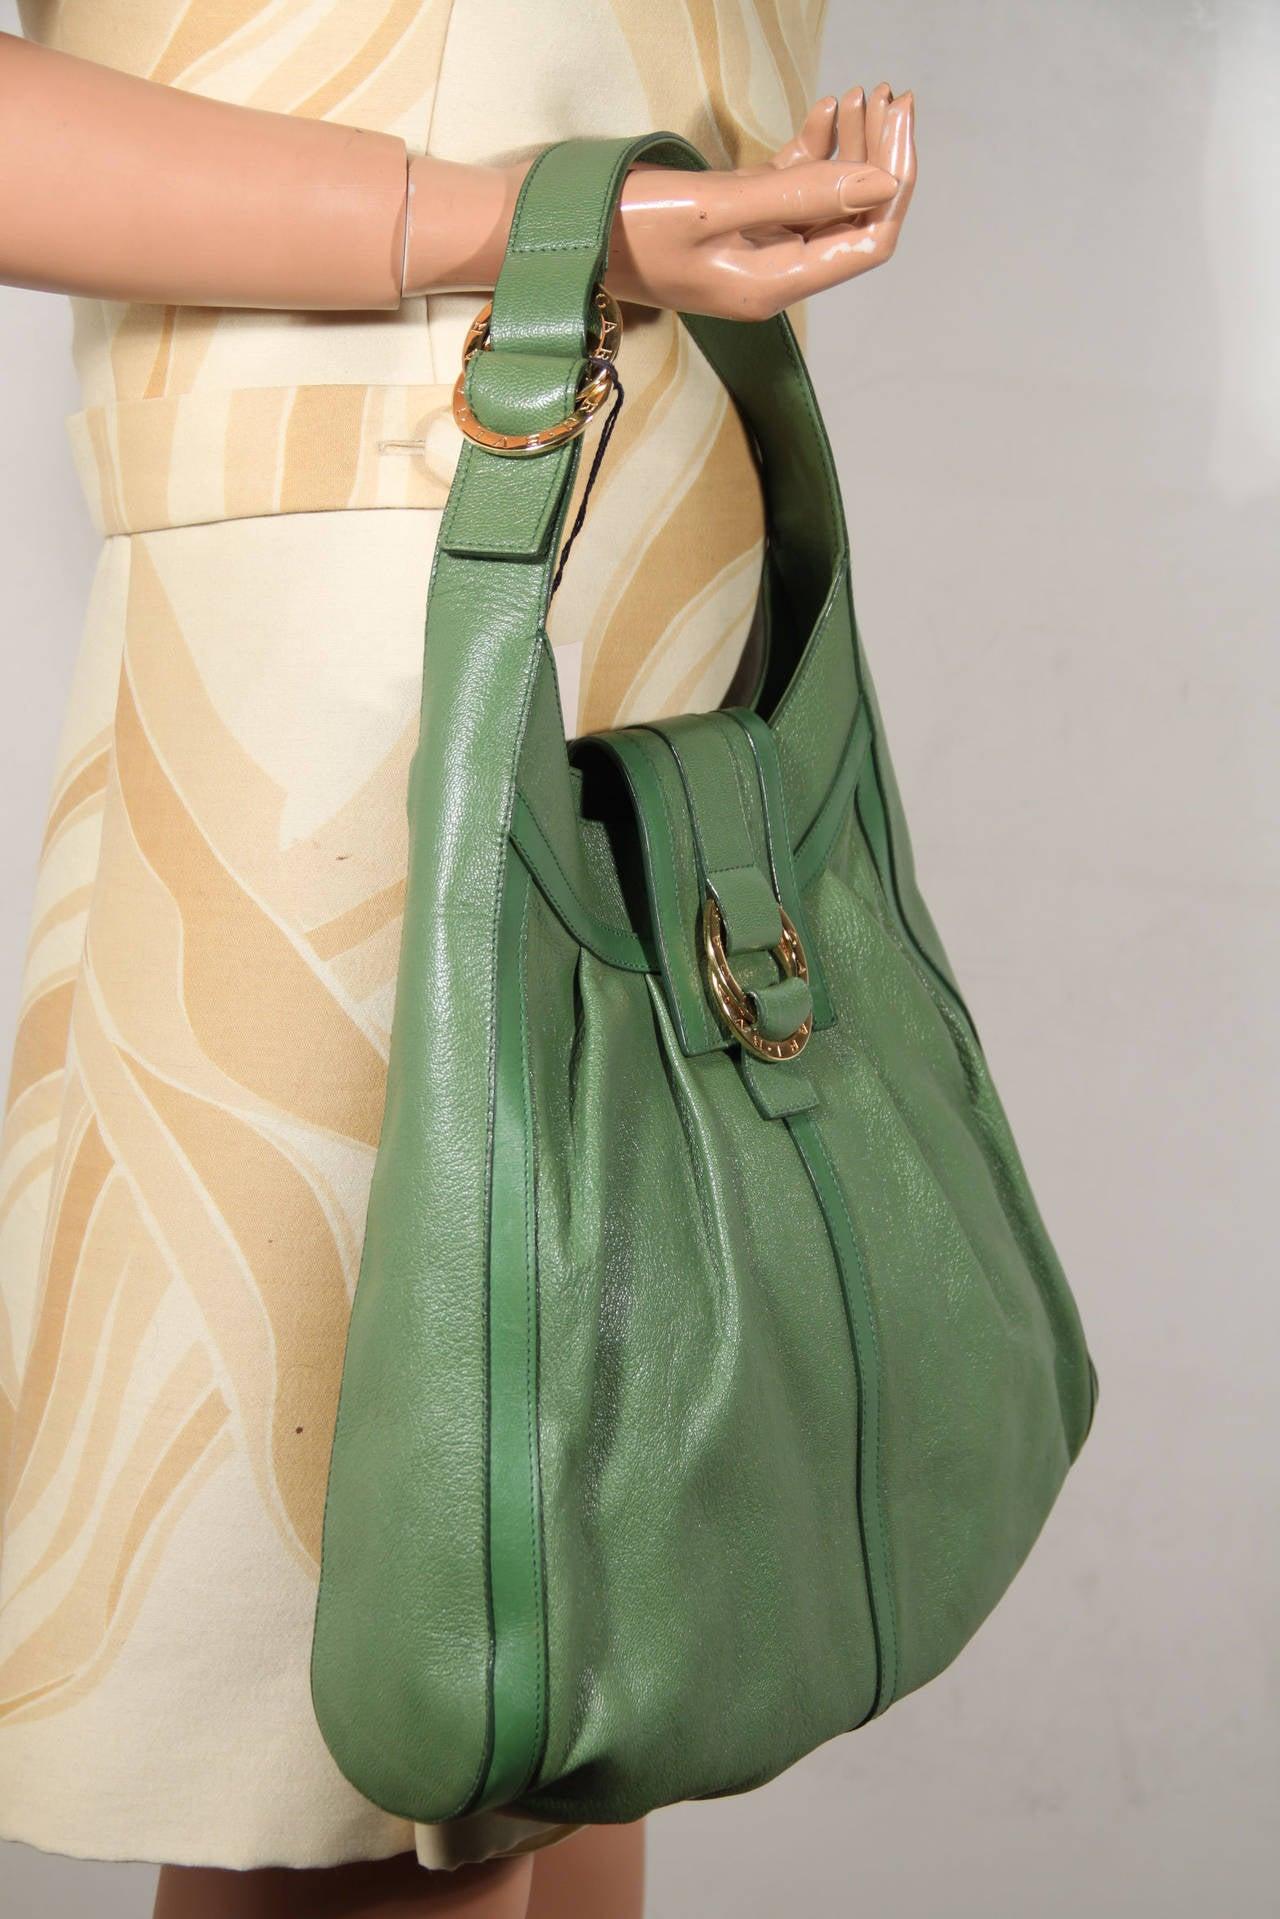 BULGARI BVLGARI Italian Authentic Green Leather CHANDRA BAG Shoulder Bag HOBO 4